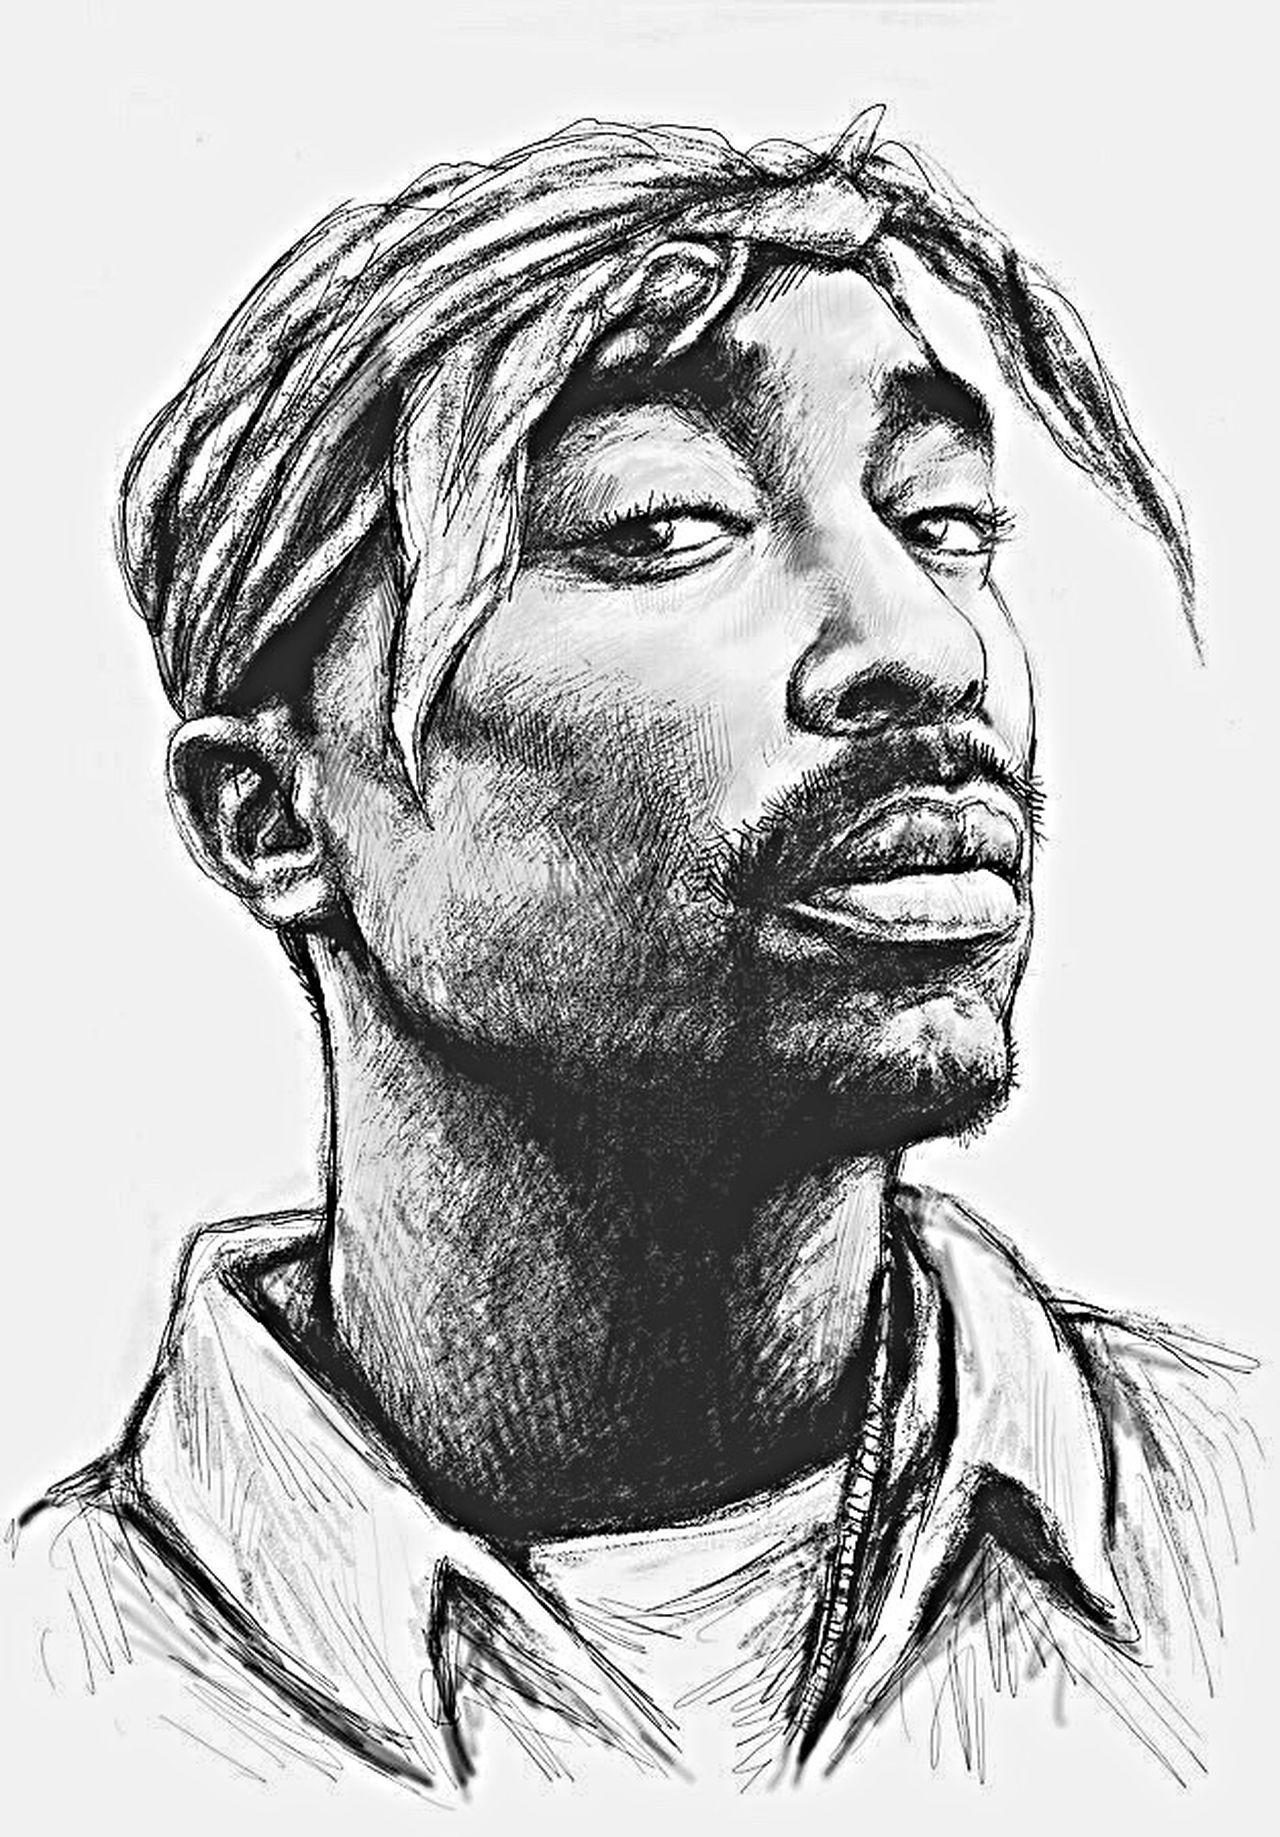 Tupac Amaru Shakur 2pac ♡ Makaveli LesaneParishCooks Outlawz Thug Life WestCoast Westside Pencil Drawing First Eyeem Photo